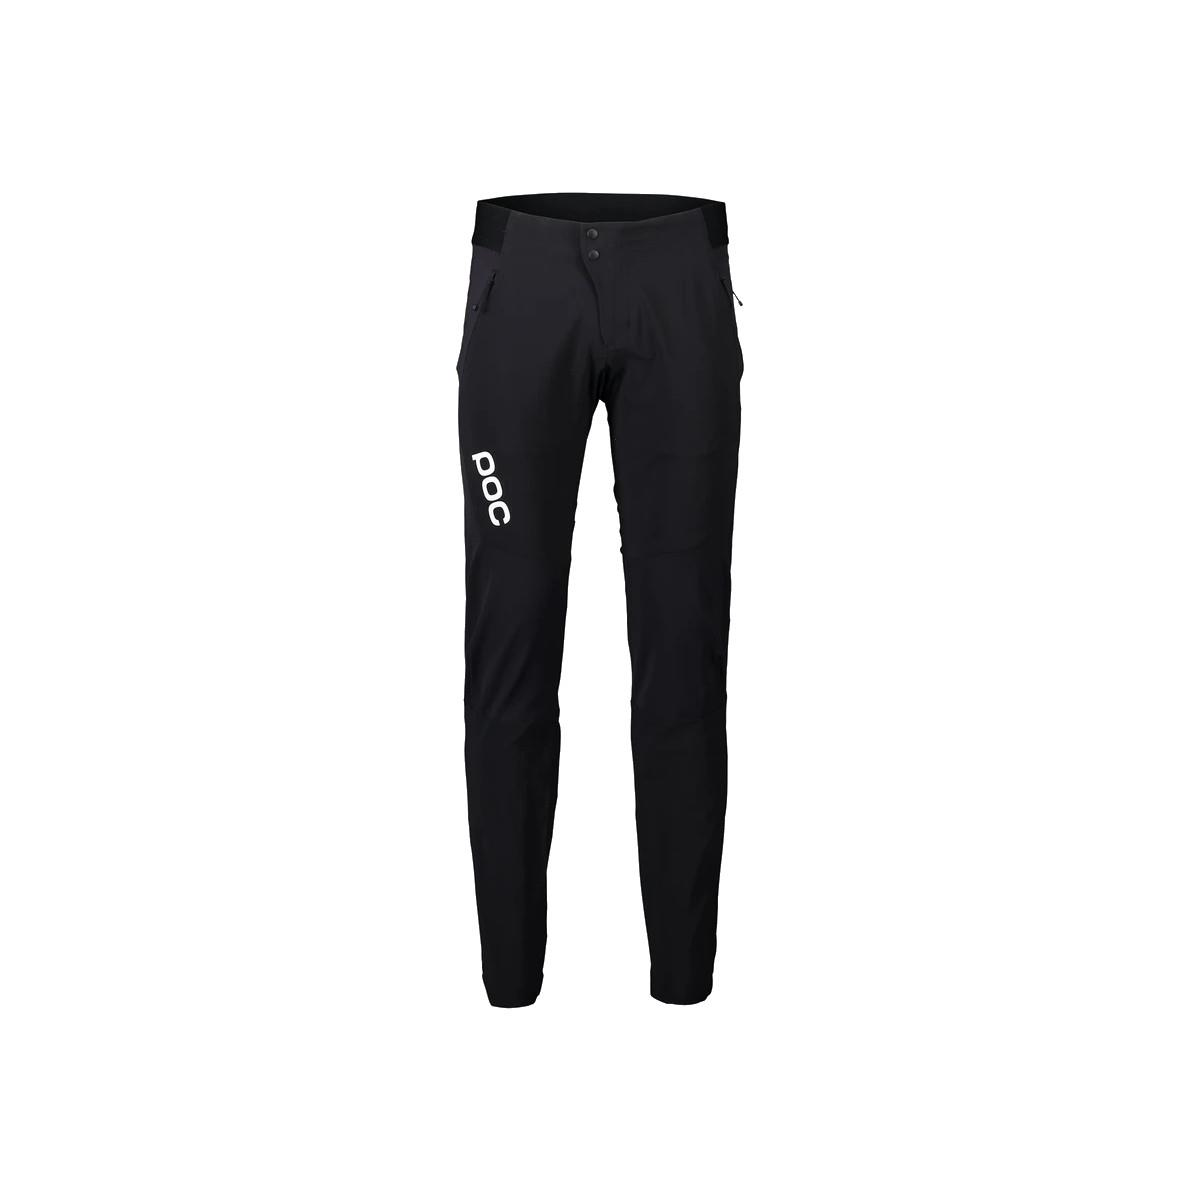 Pantaloni Enduro Rhythm Resistance Idrorepellenti Nero Taglia XS